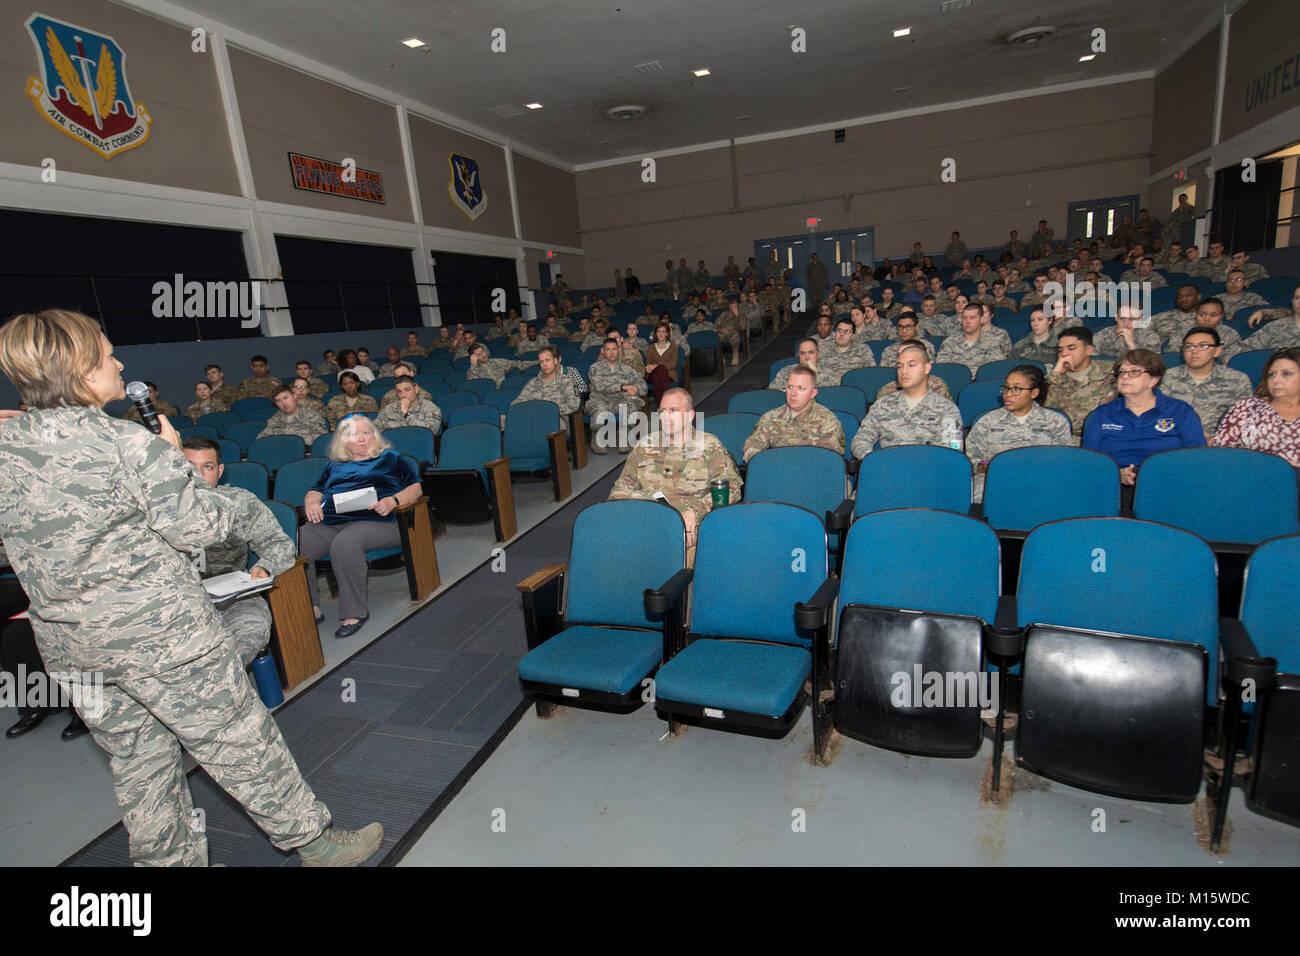 Col. Jennifer Short, 23d Wing commander, looks inside the